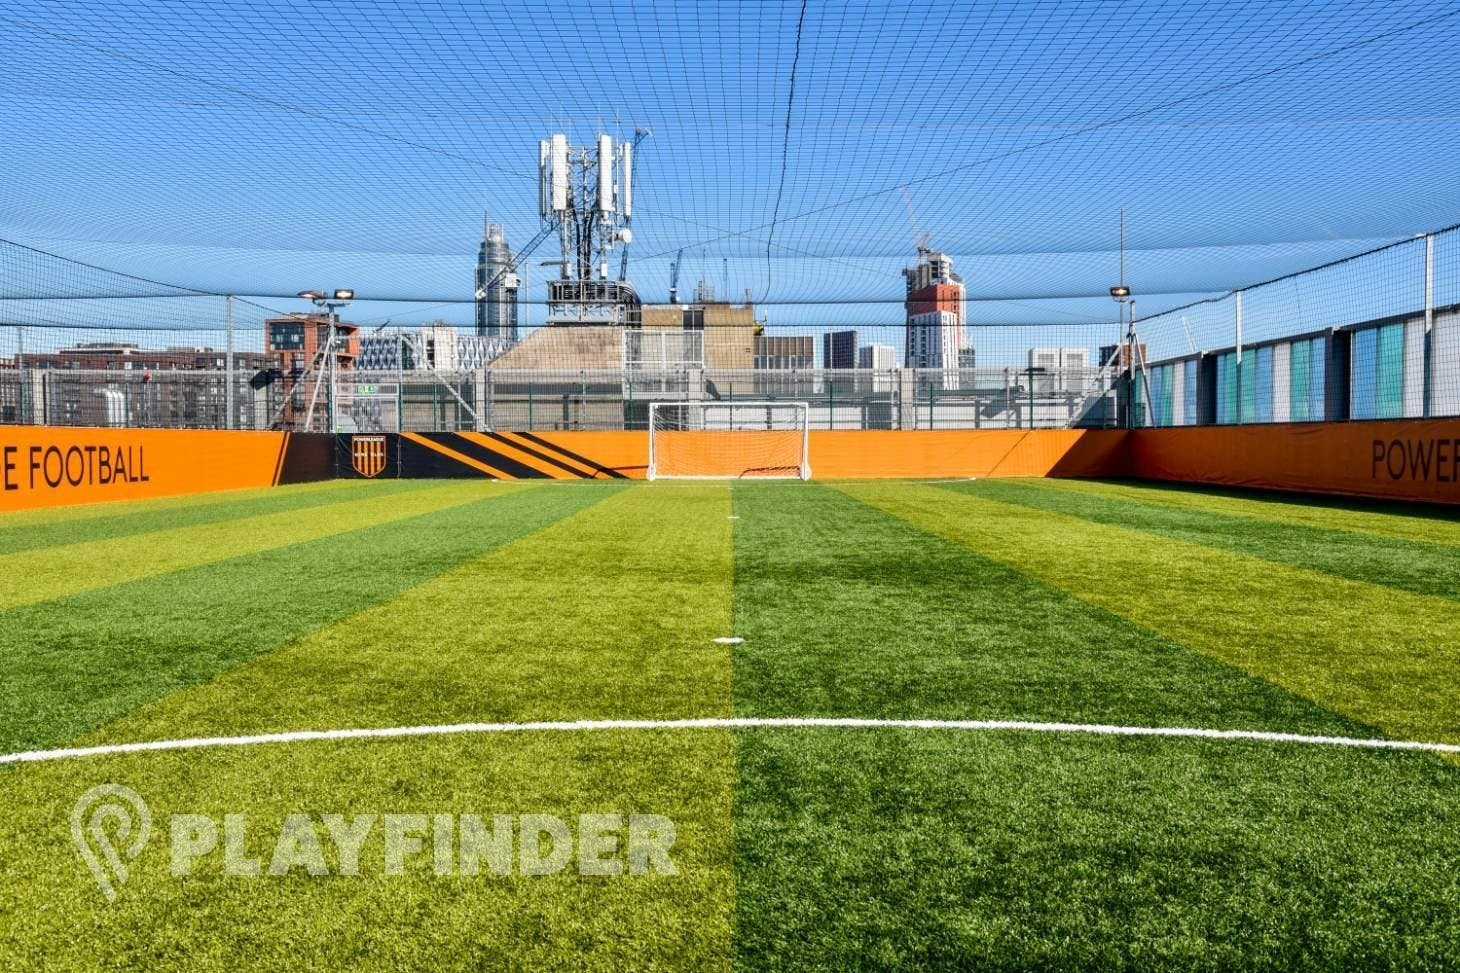 Powerleague Nine Elms 7 a side | 3G Astroturf football pitch